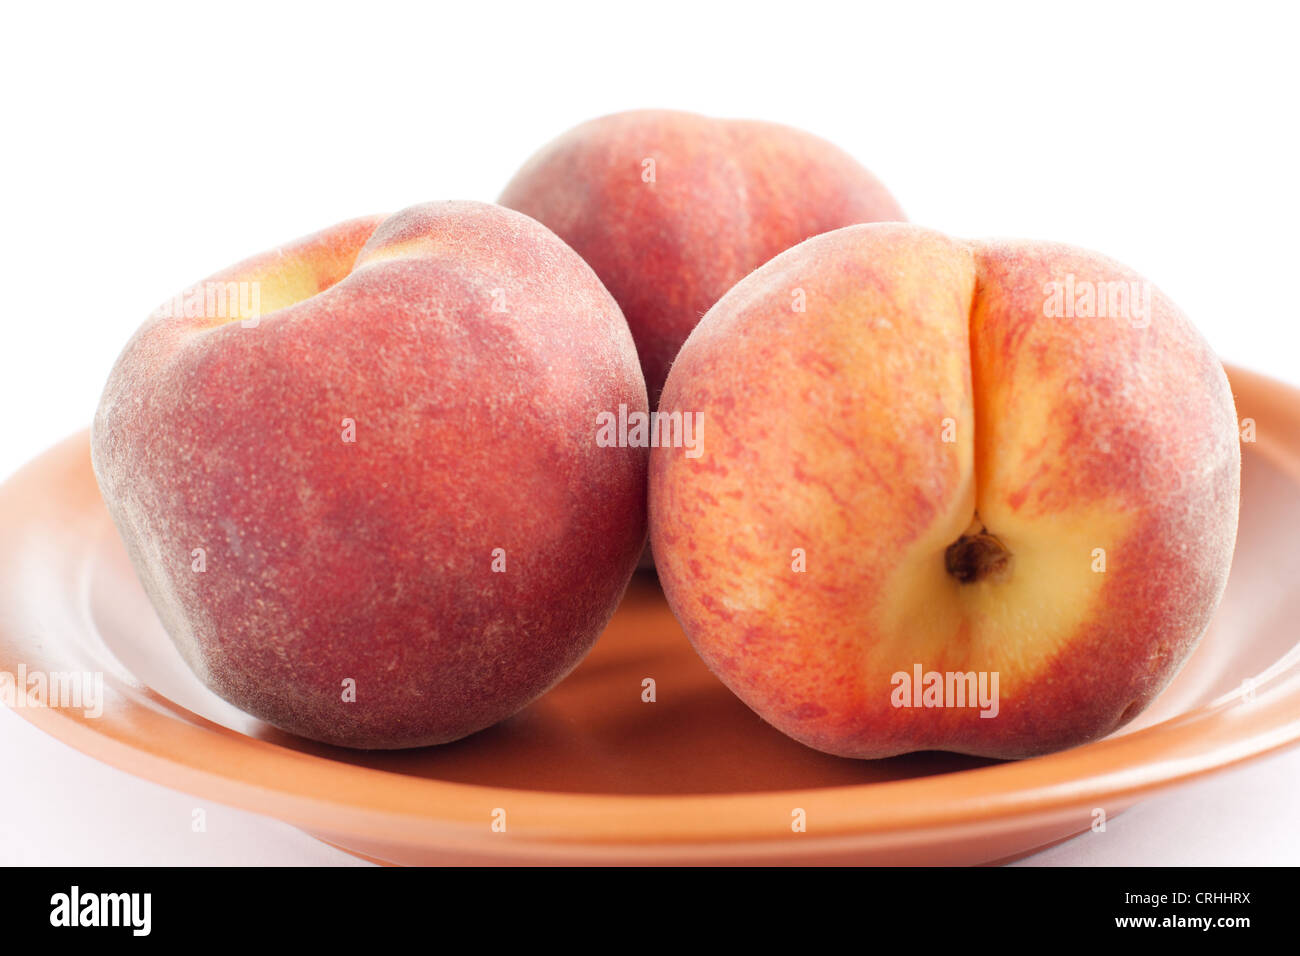 Three ripe peach on a ceramic plate - Stock Image